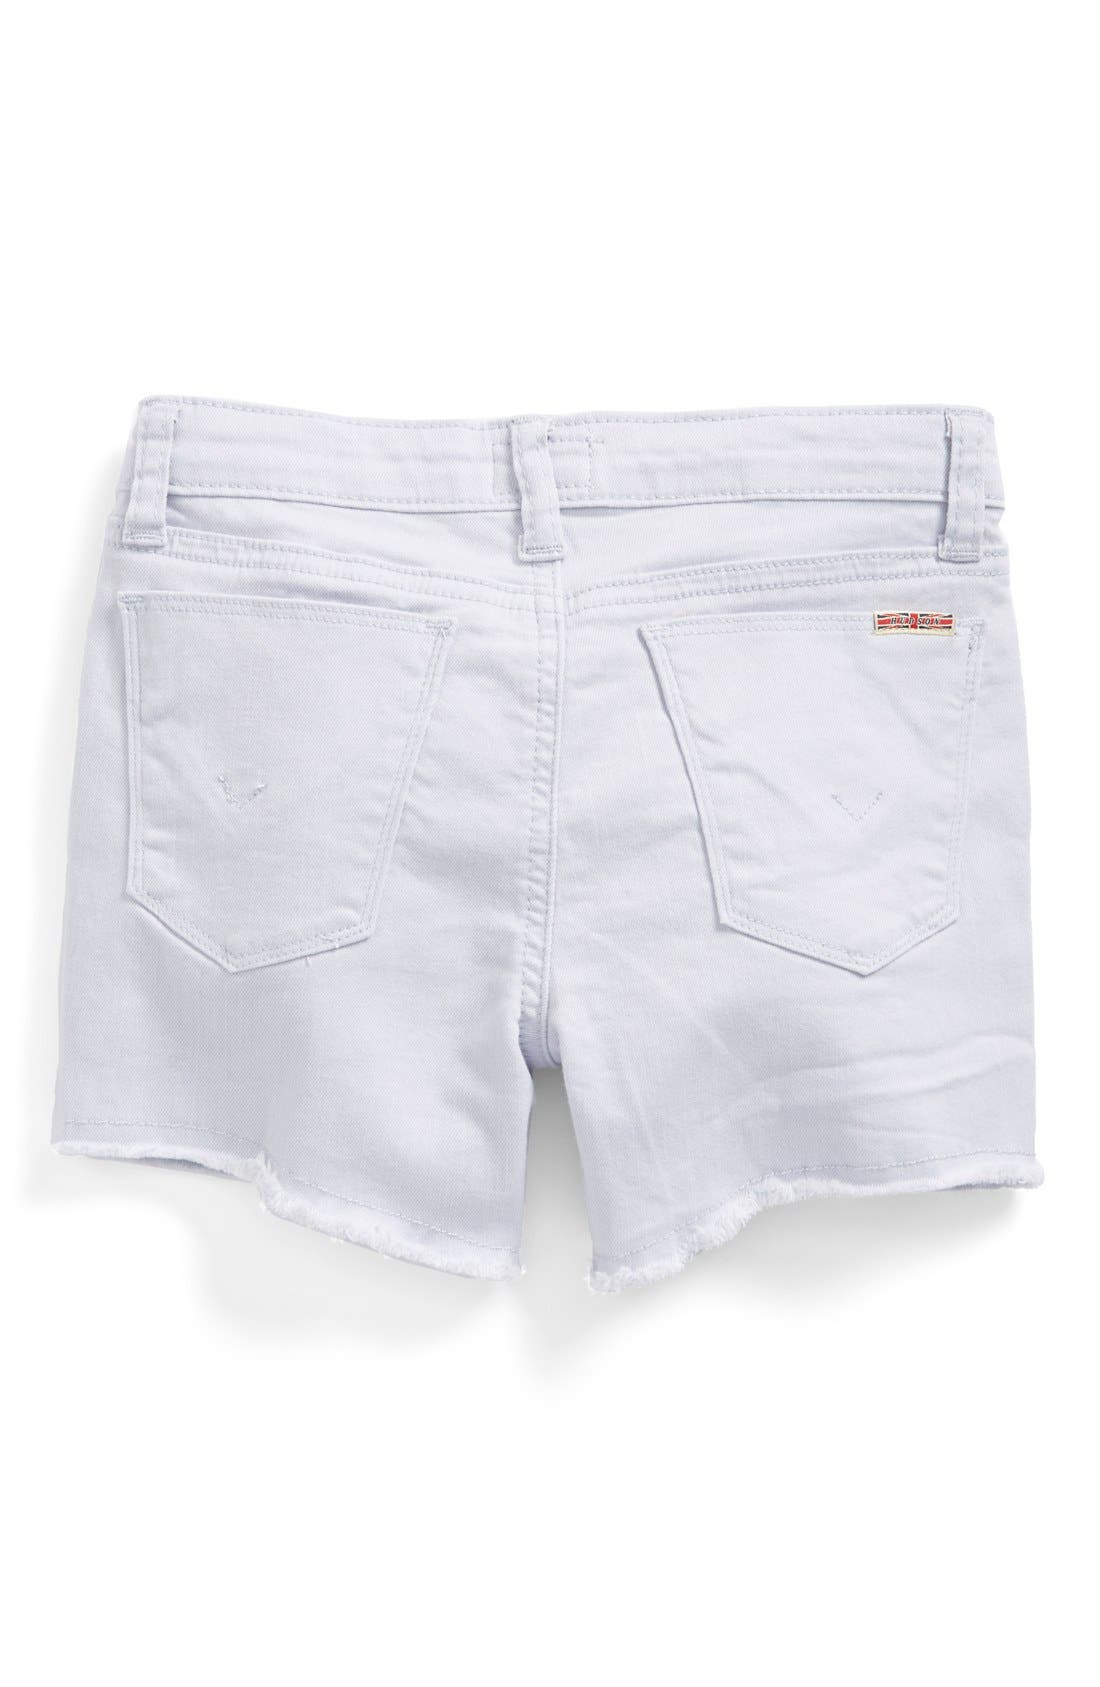 Main Image - Hudson Kids Raw Edge Jean Shorts (Big Girls)